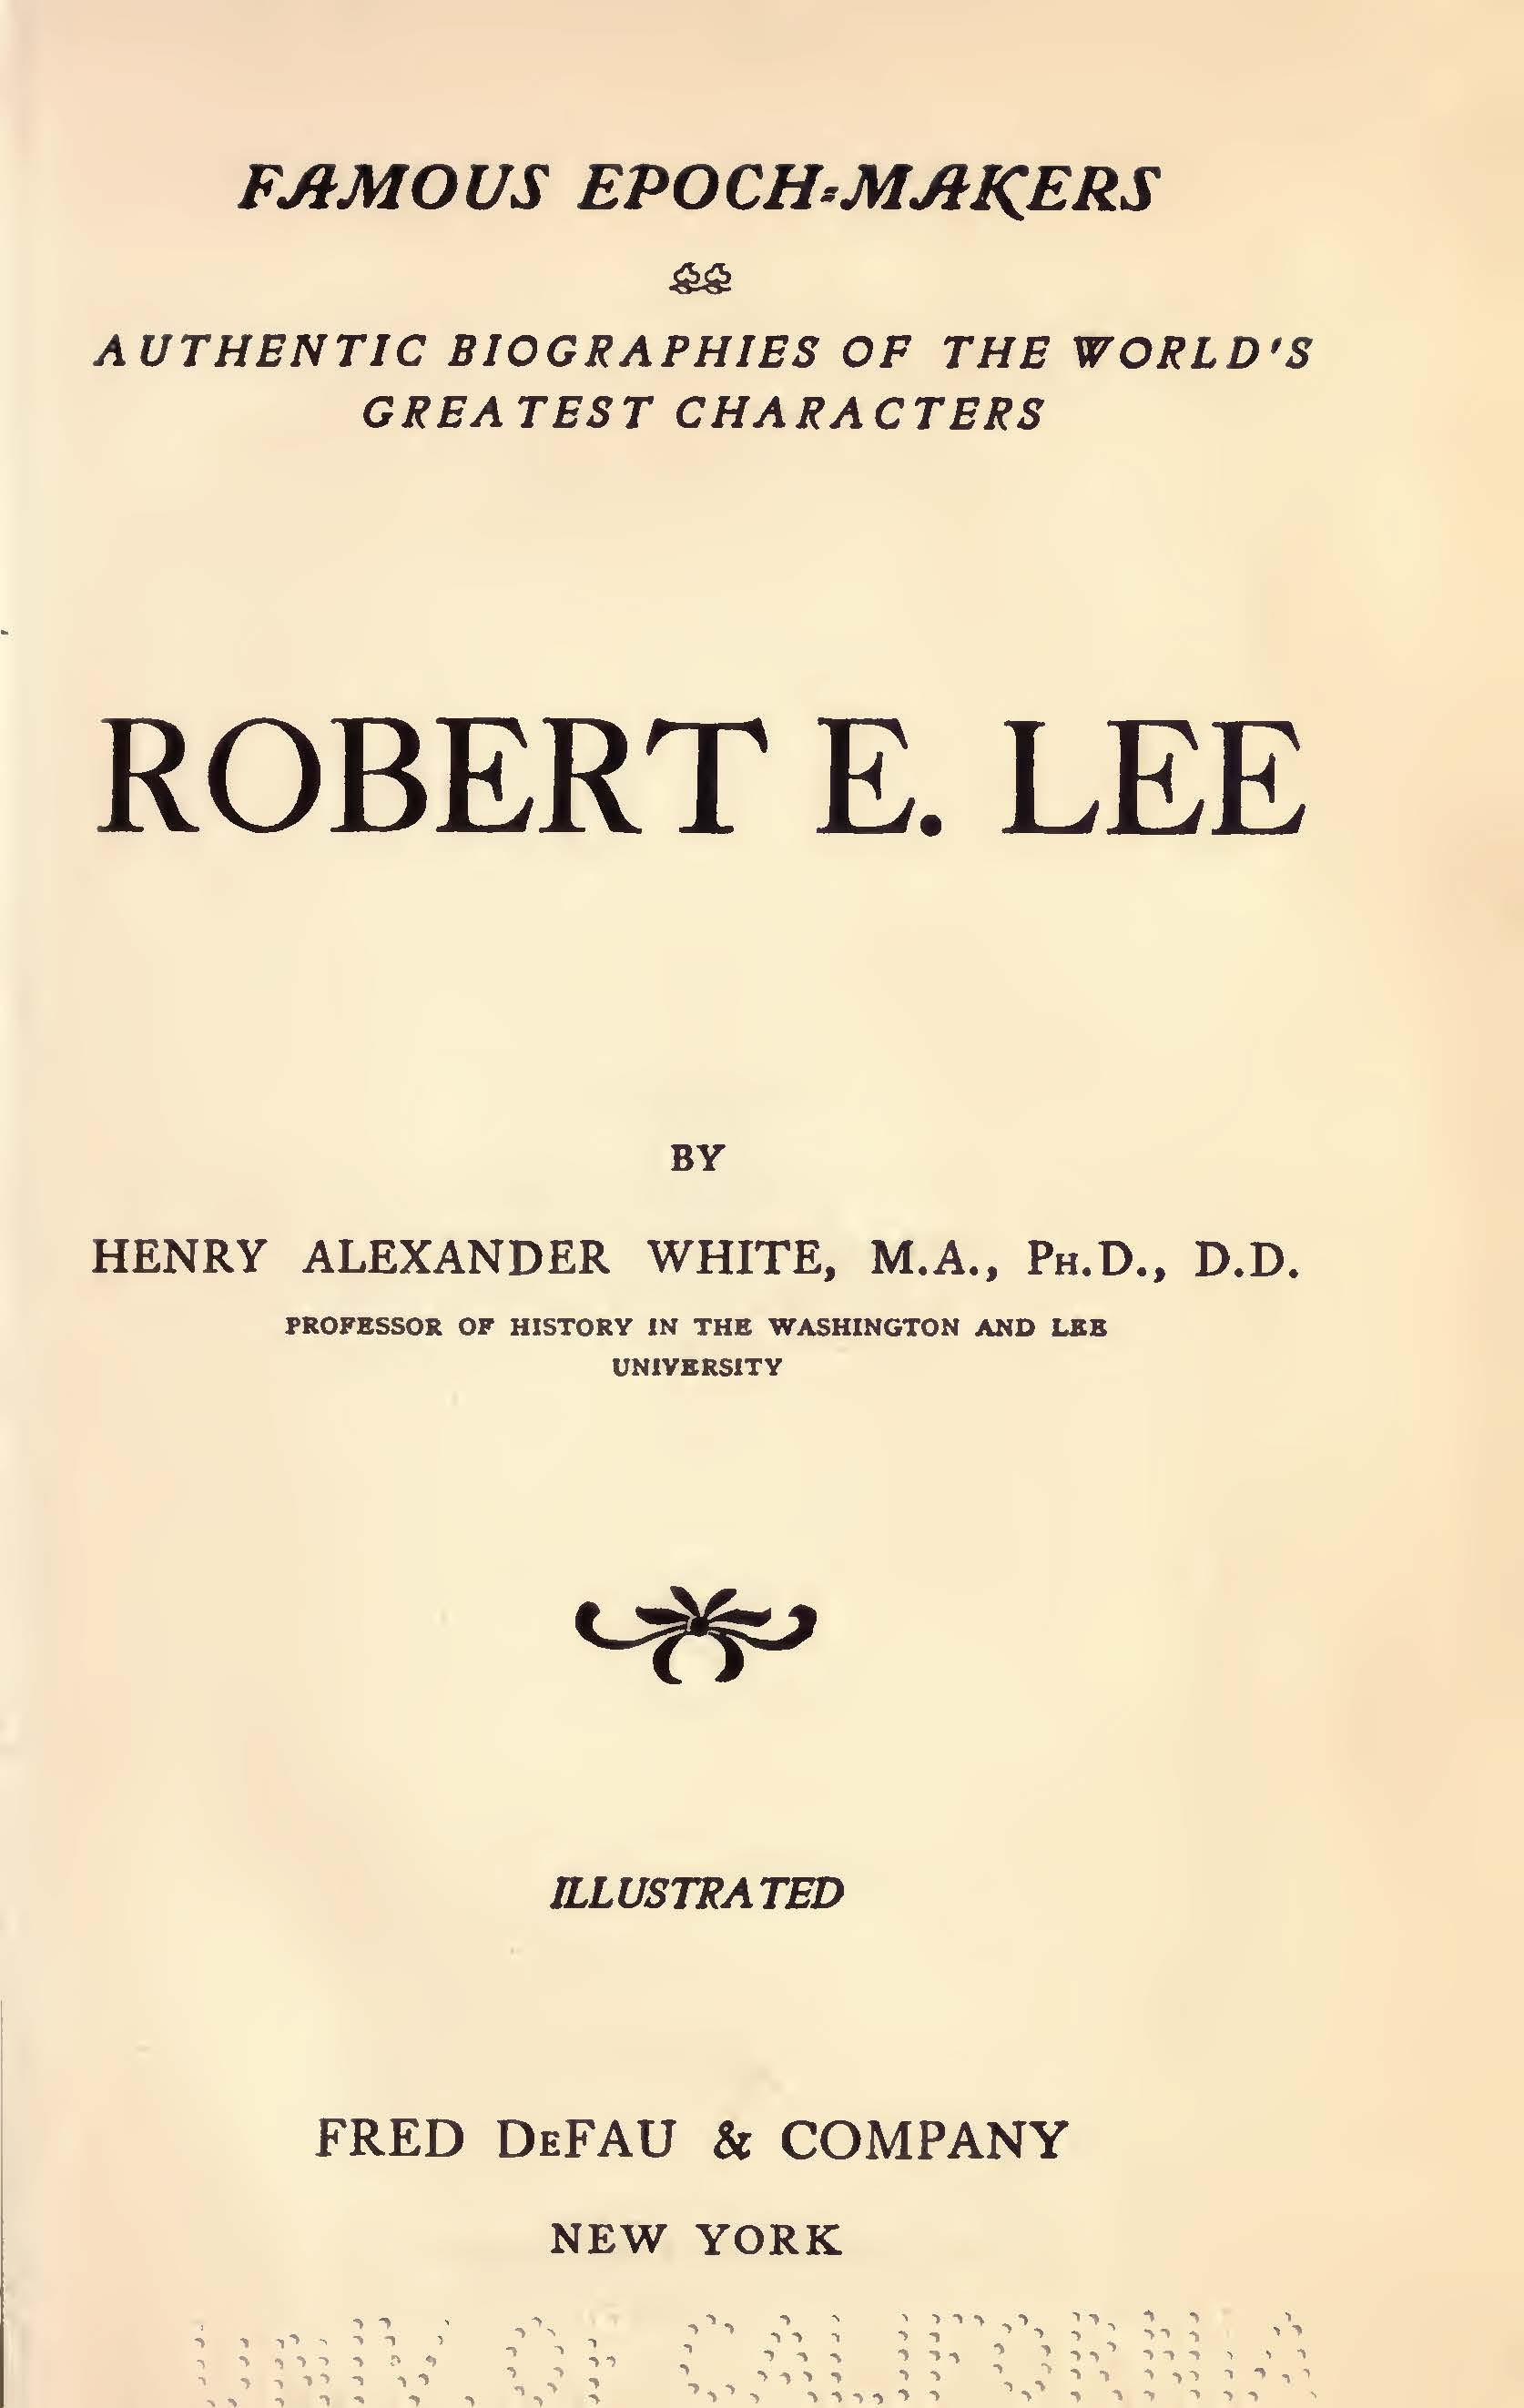 White, Henry Alexander, Robert E Lee Title Page.jpg